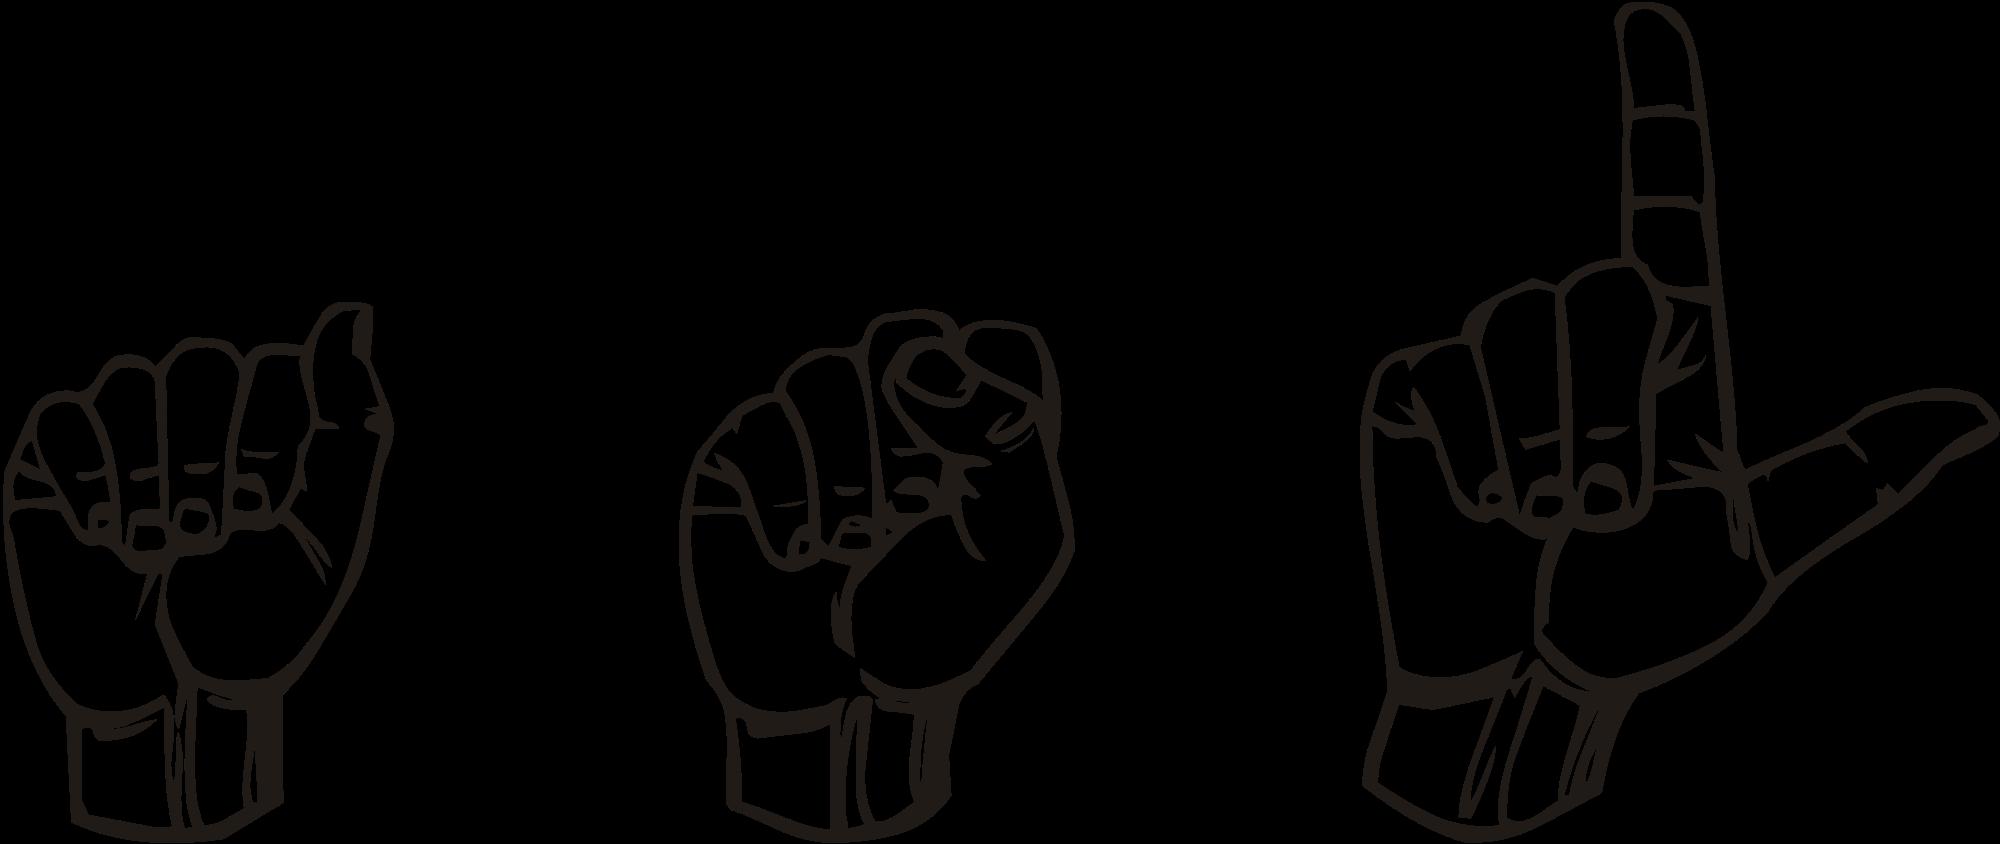 x in sign language asl unlocking communication huffpost x language in sign